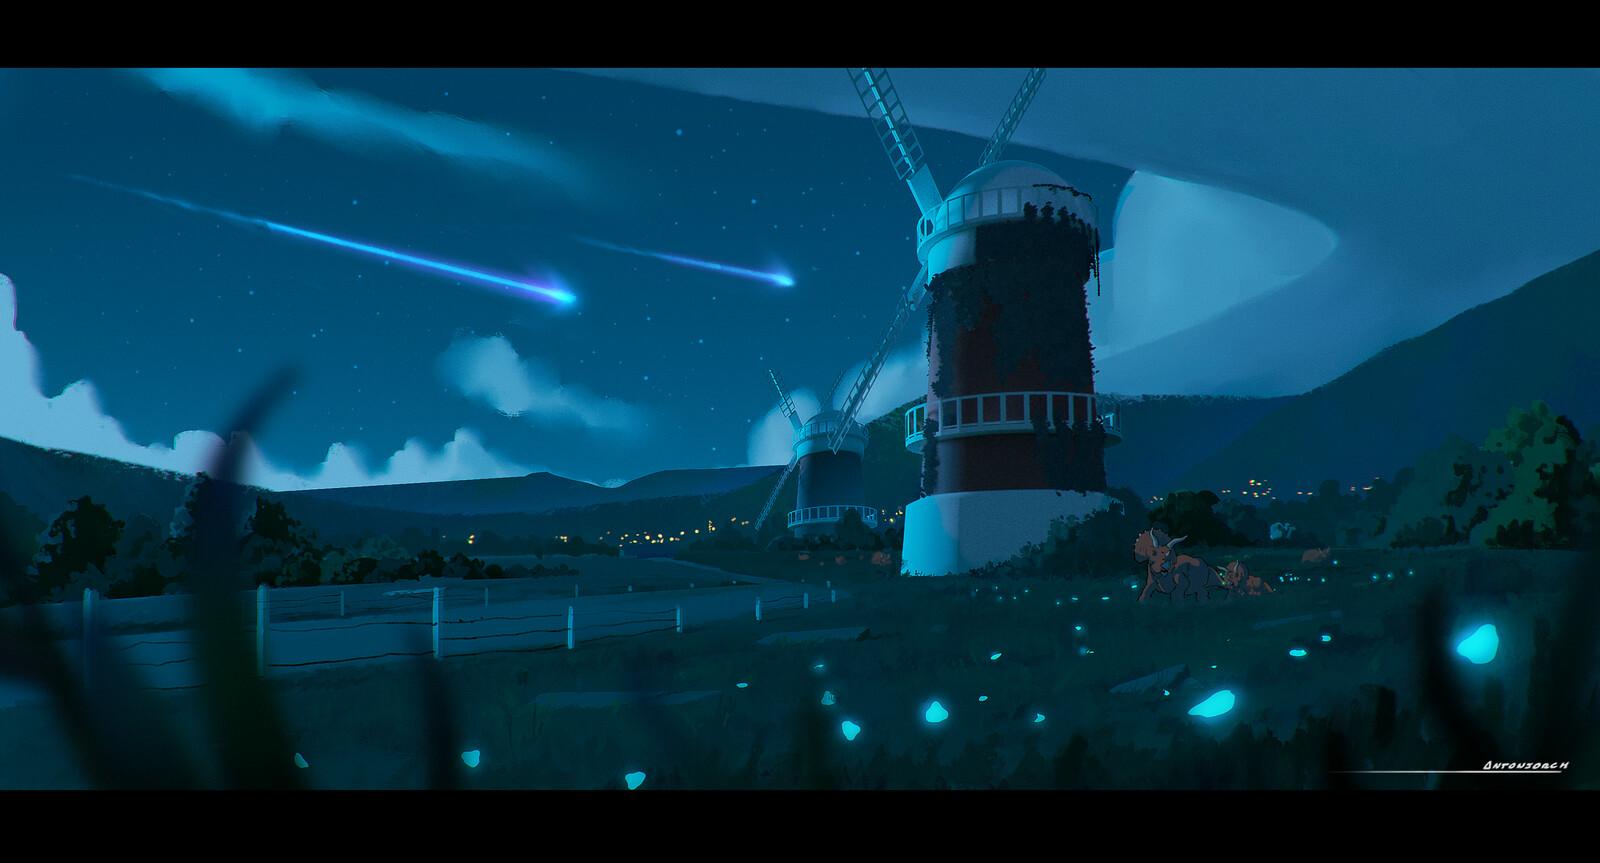 Ghibli and Dinosaurs 2